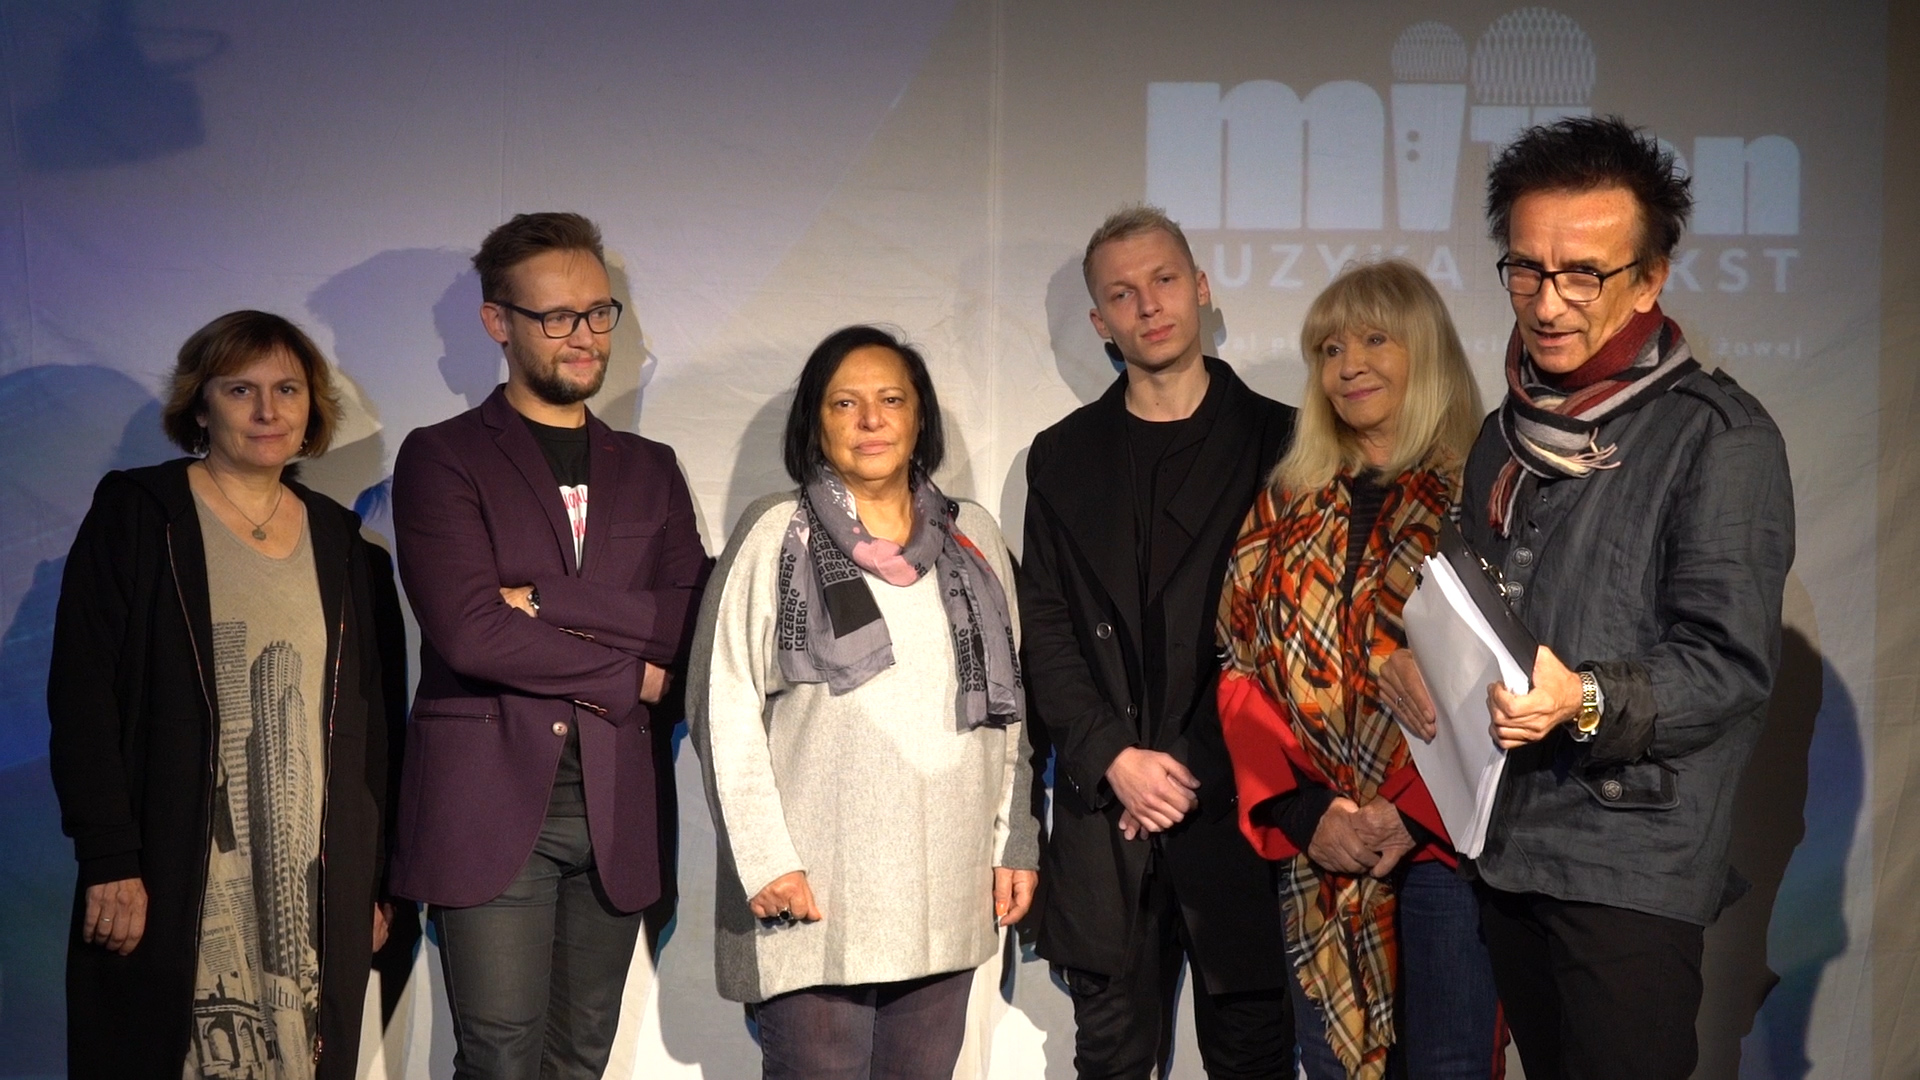 MiT TON Festiwal 2018 jury